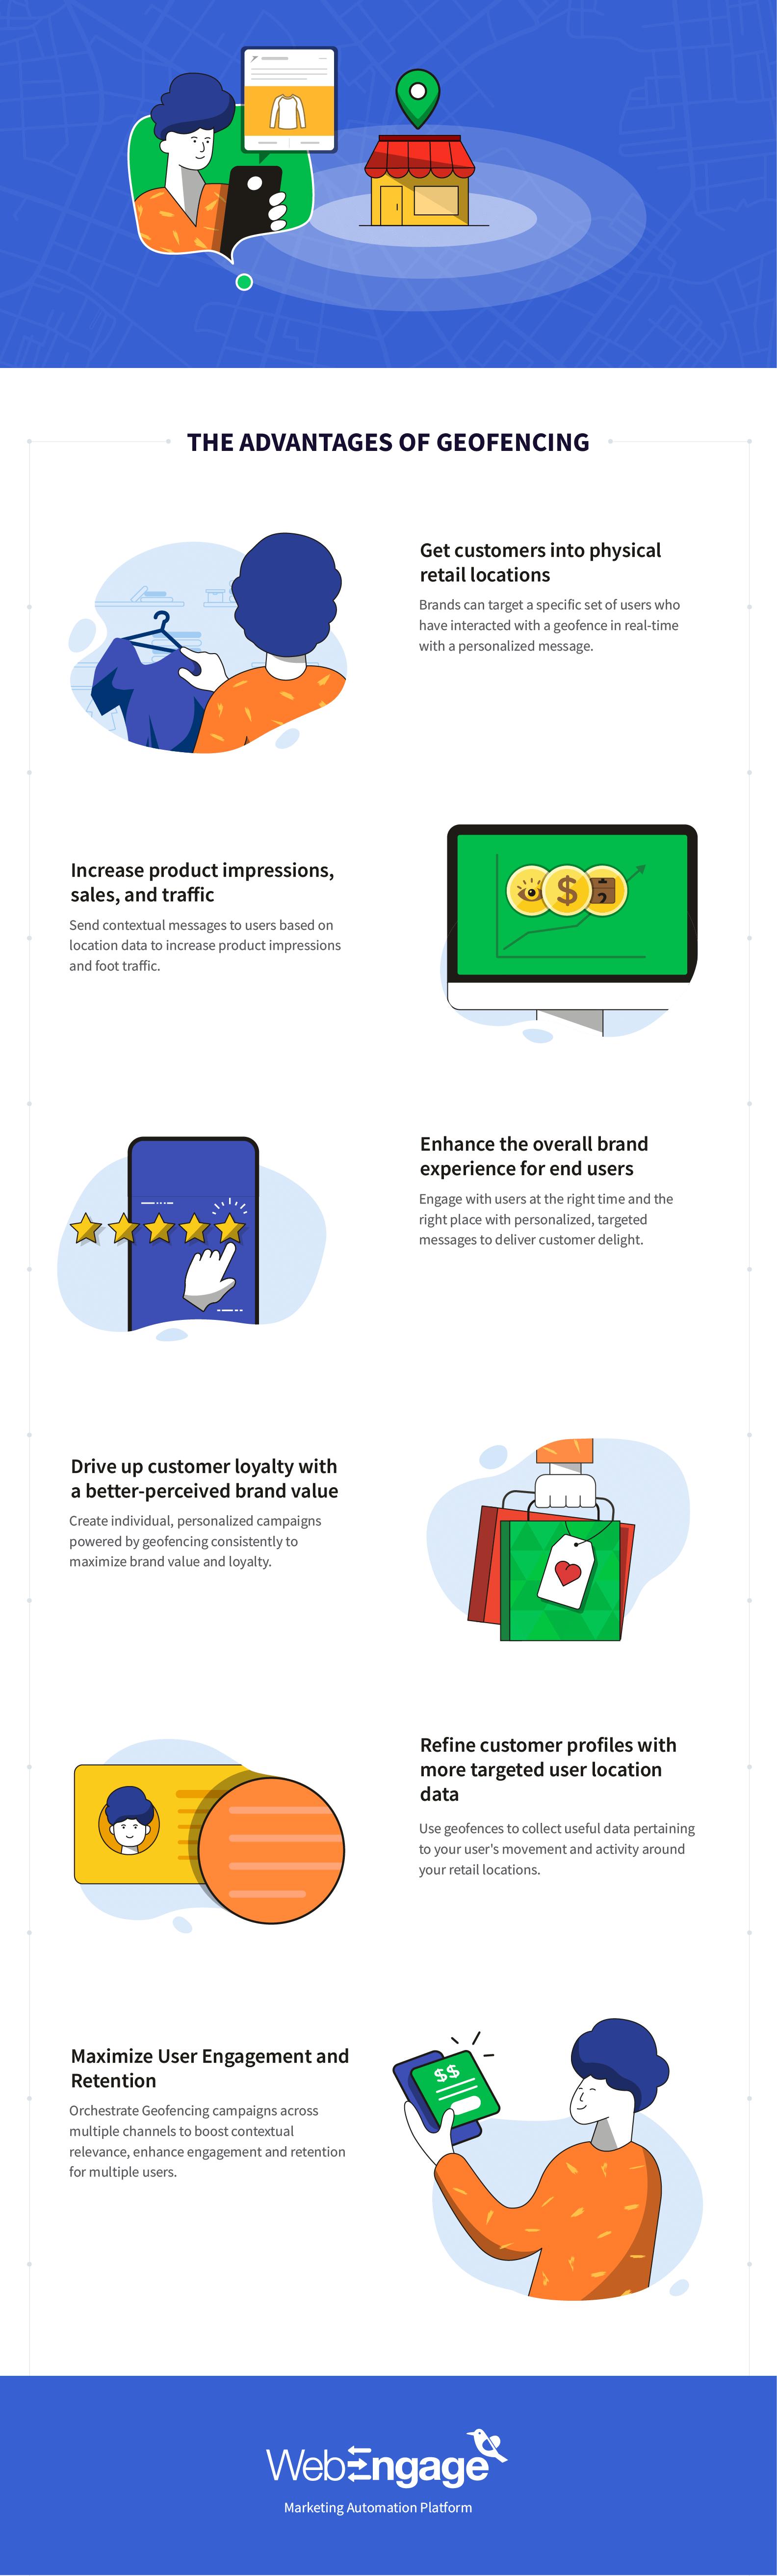 geofencing-advantages